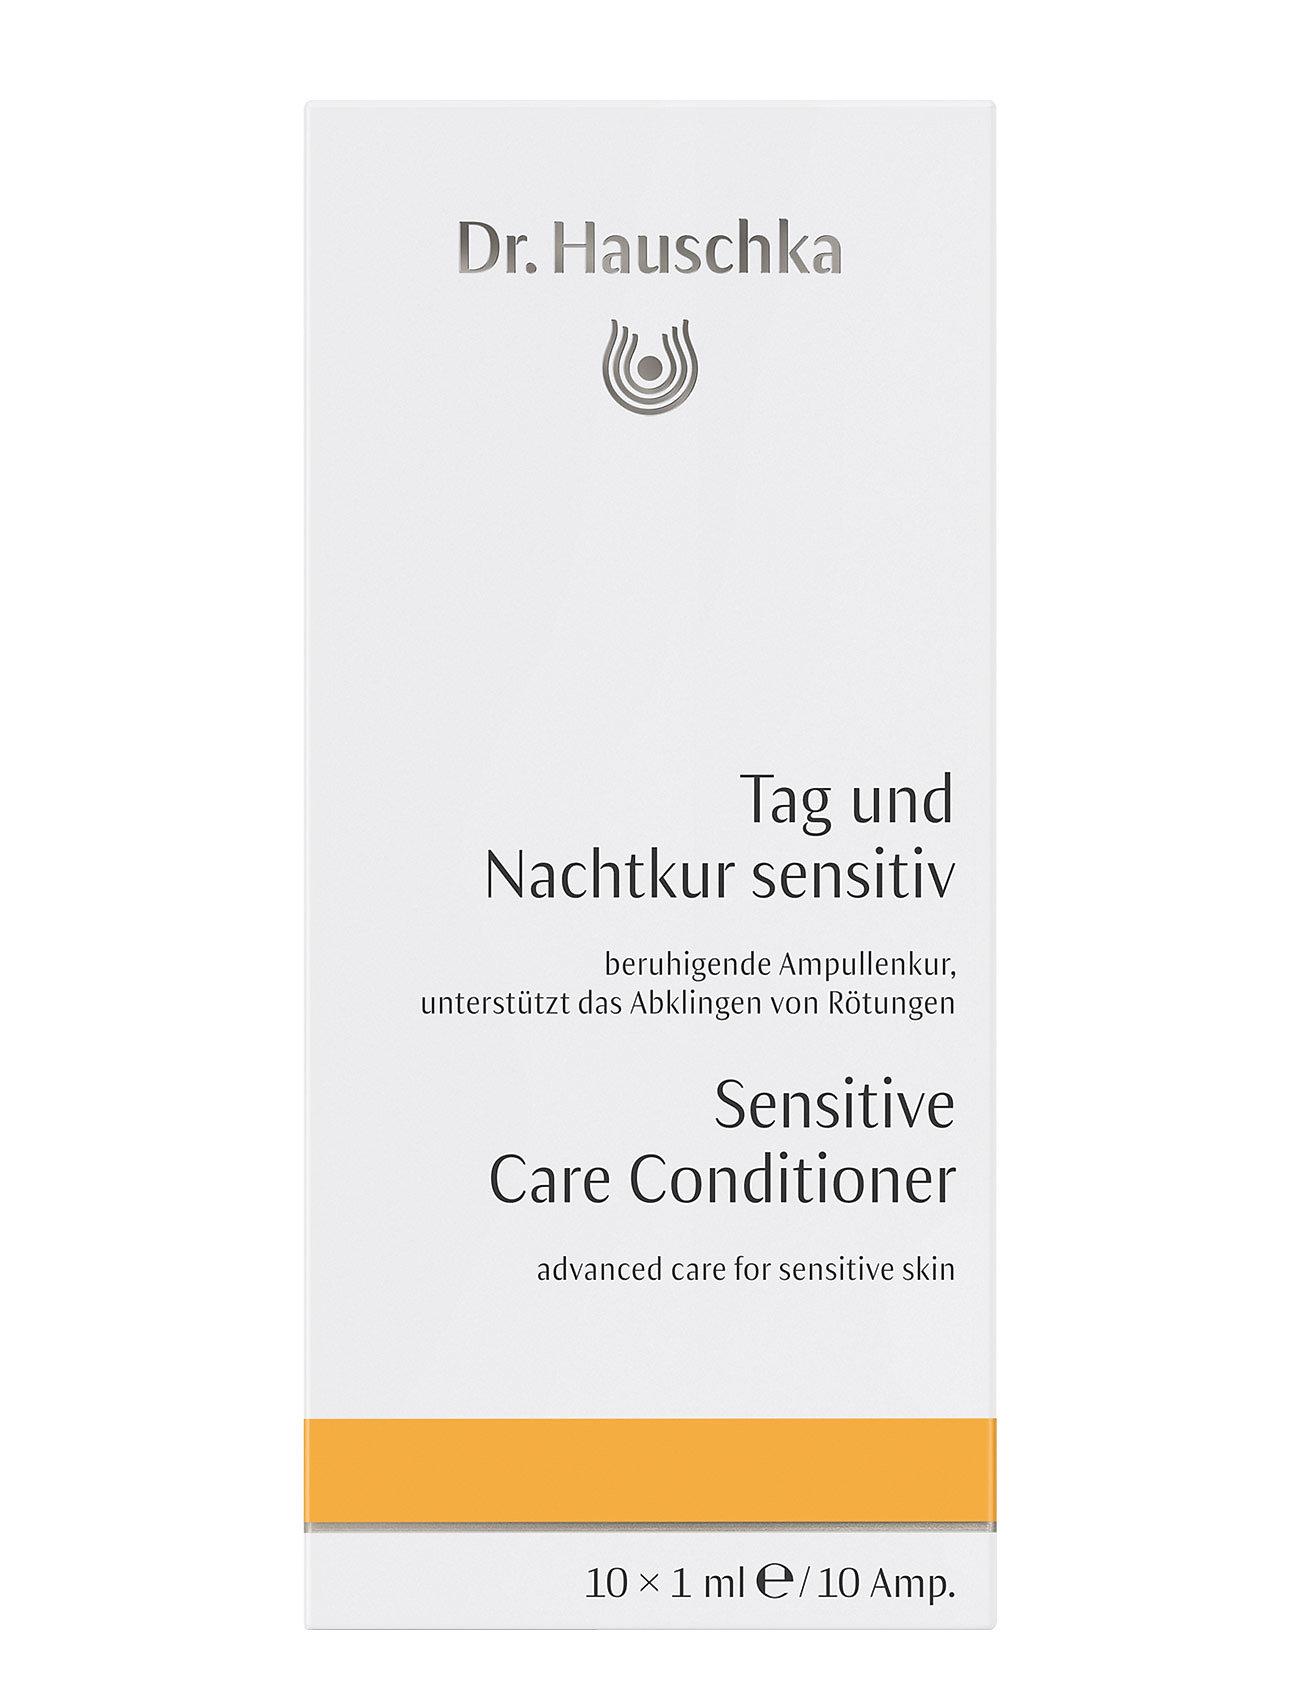 Image of Sensitive Care Conditi R Beauty WOMEN Skin Care Face Day Creams Nude Dr. Hauschka (3419180601)